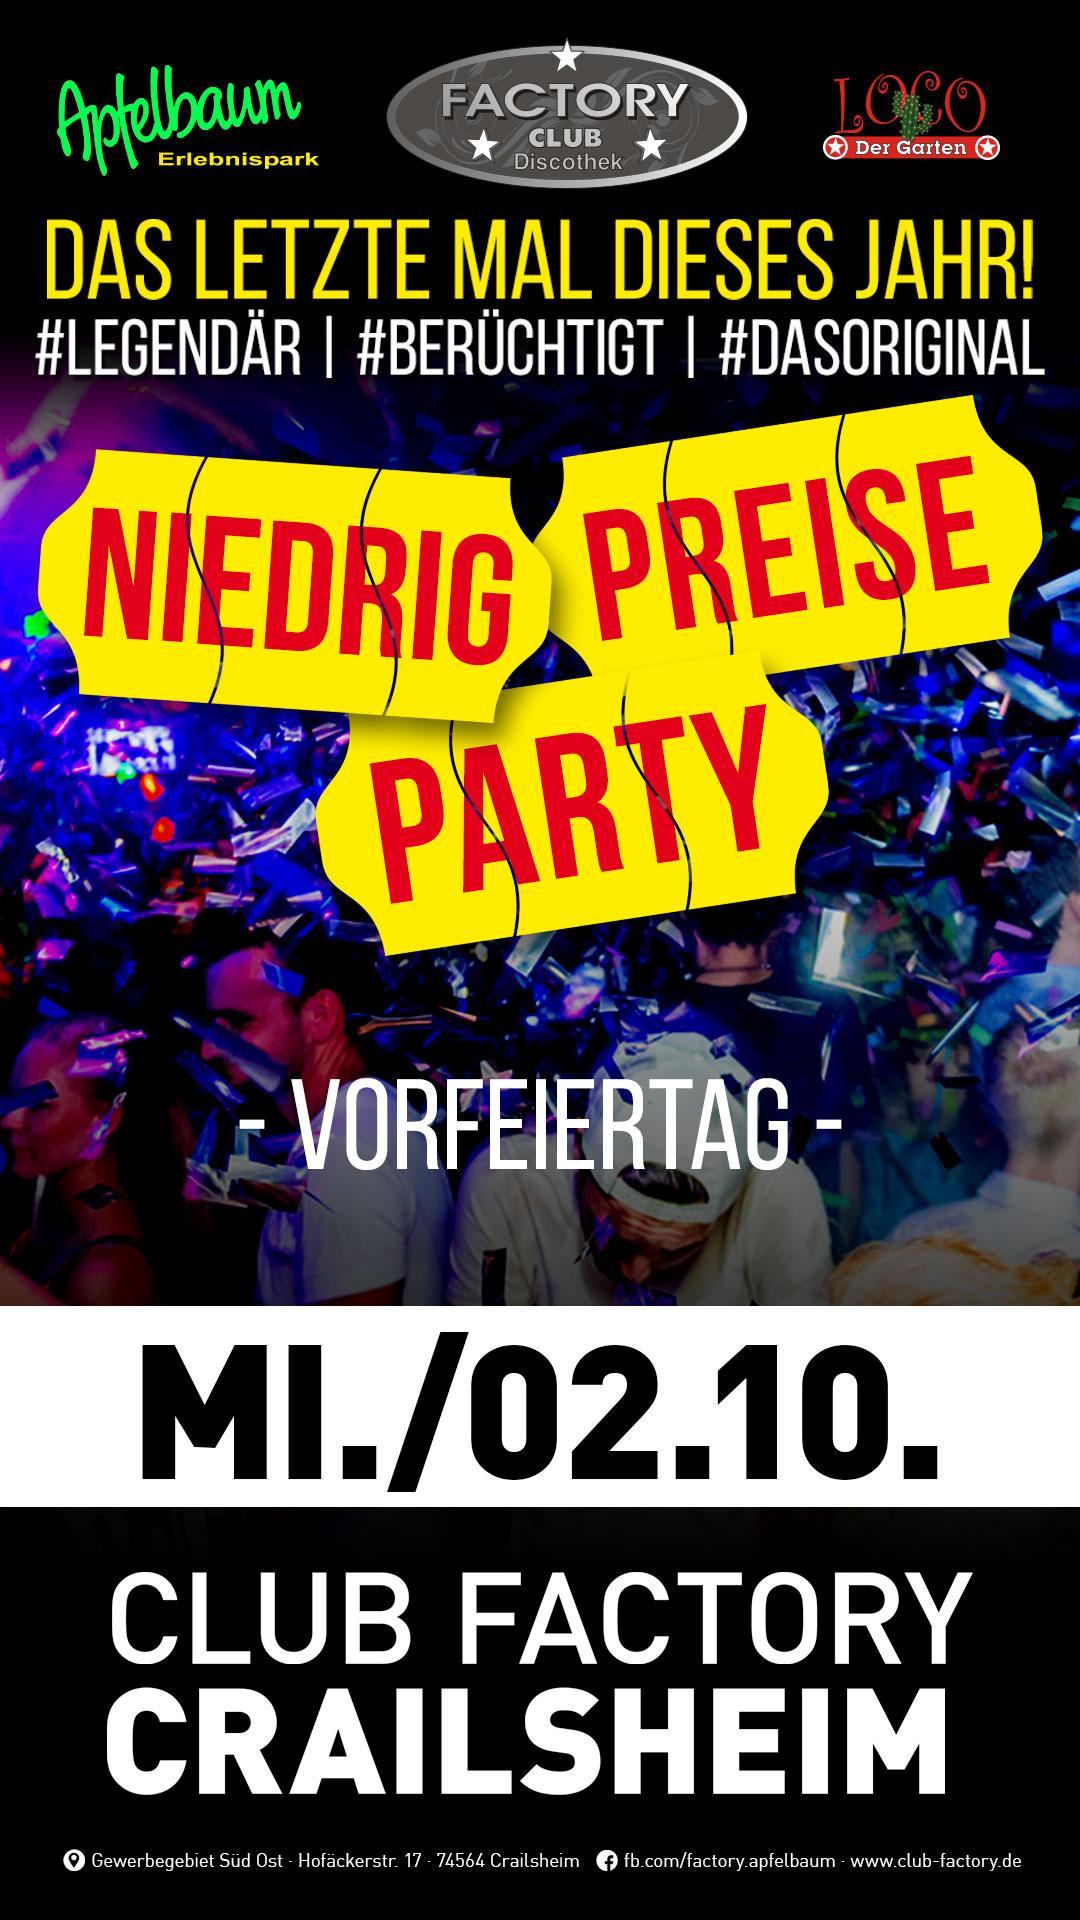 Niedrig-Preise-Party